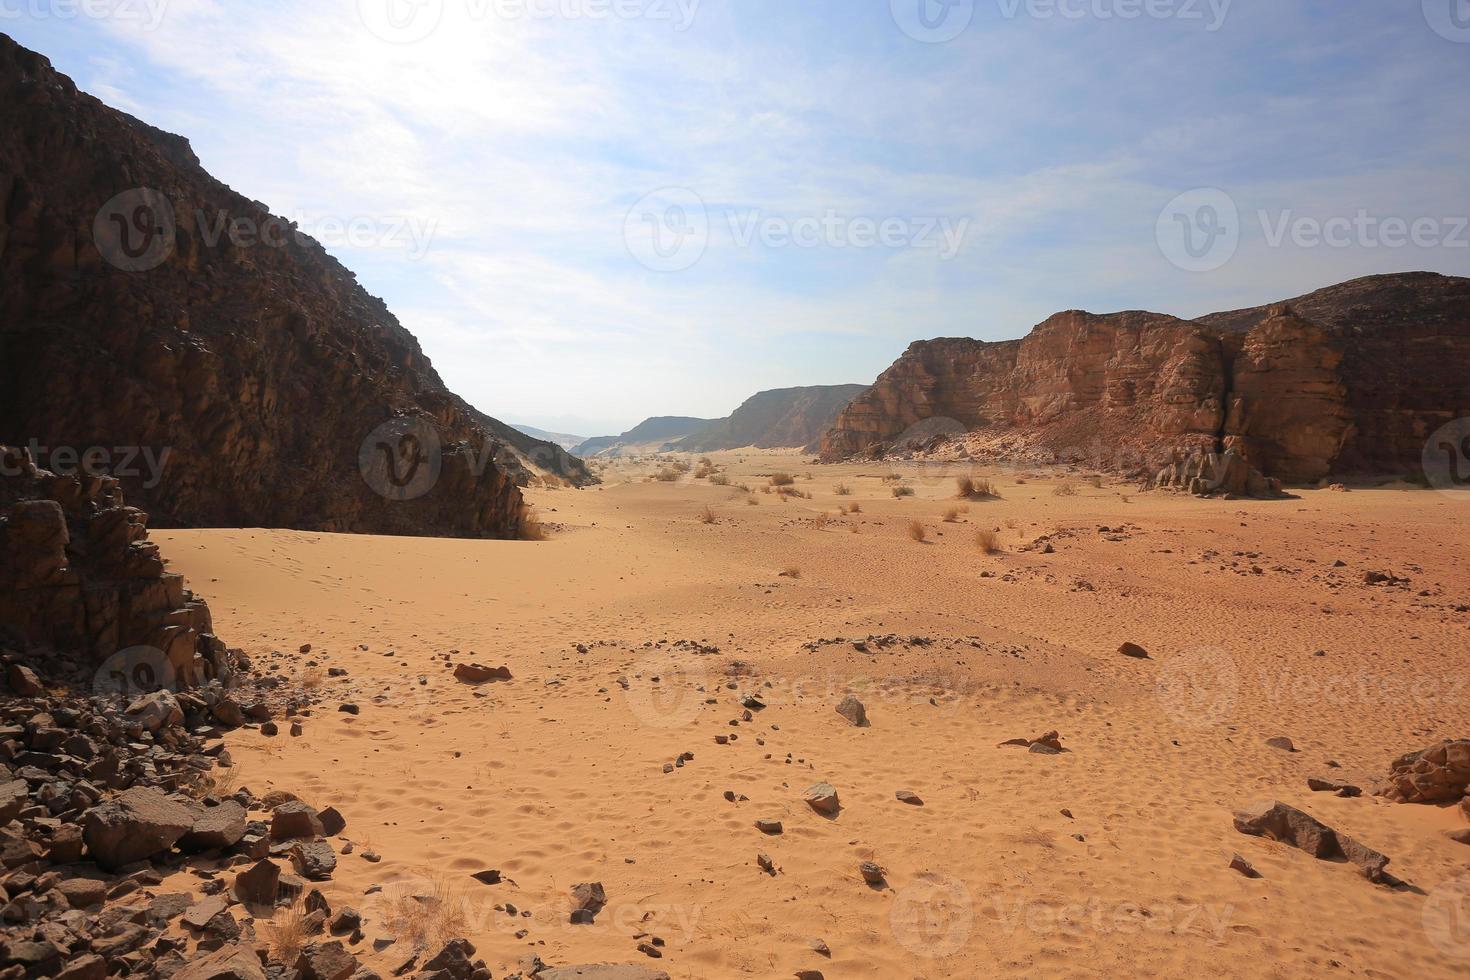 canyon in de woestijn foto